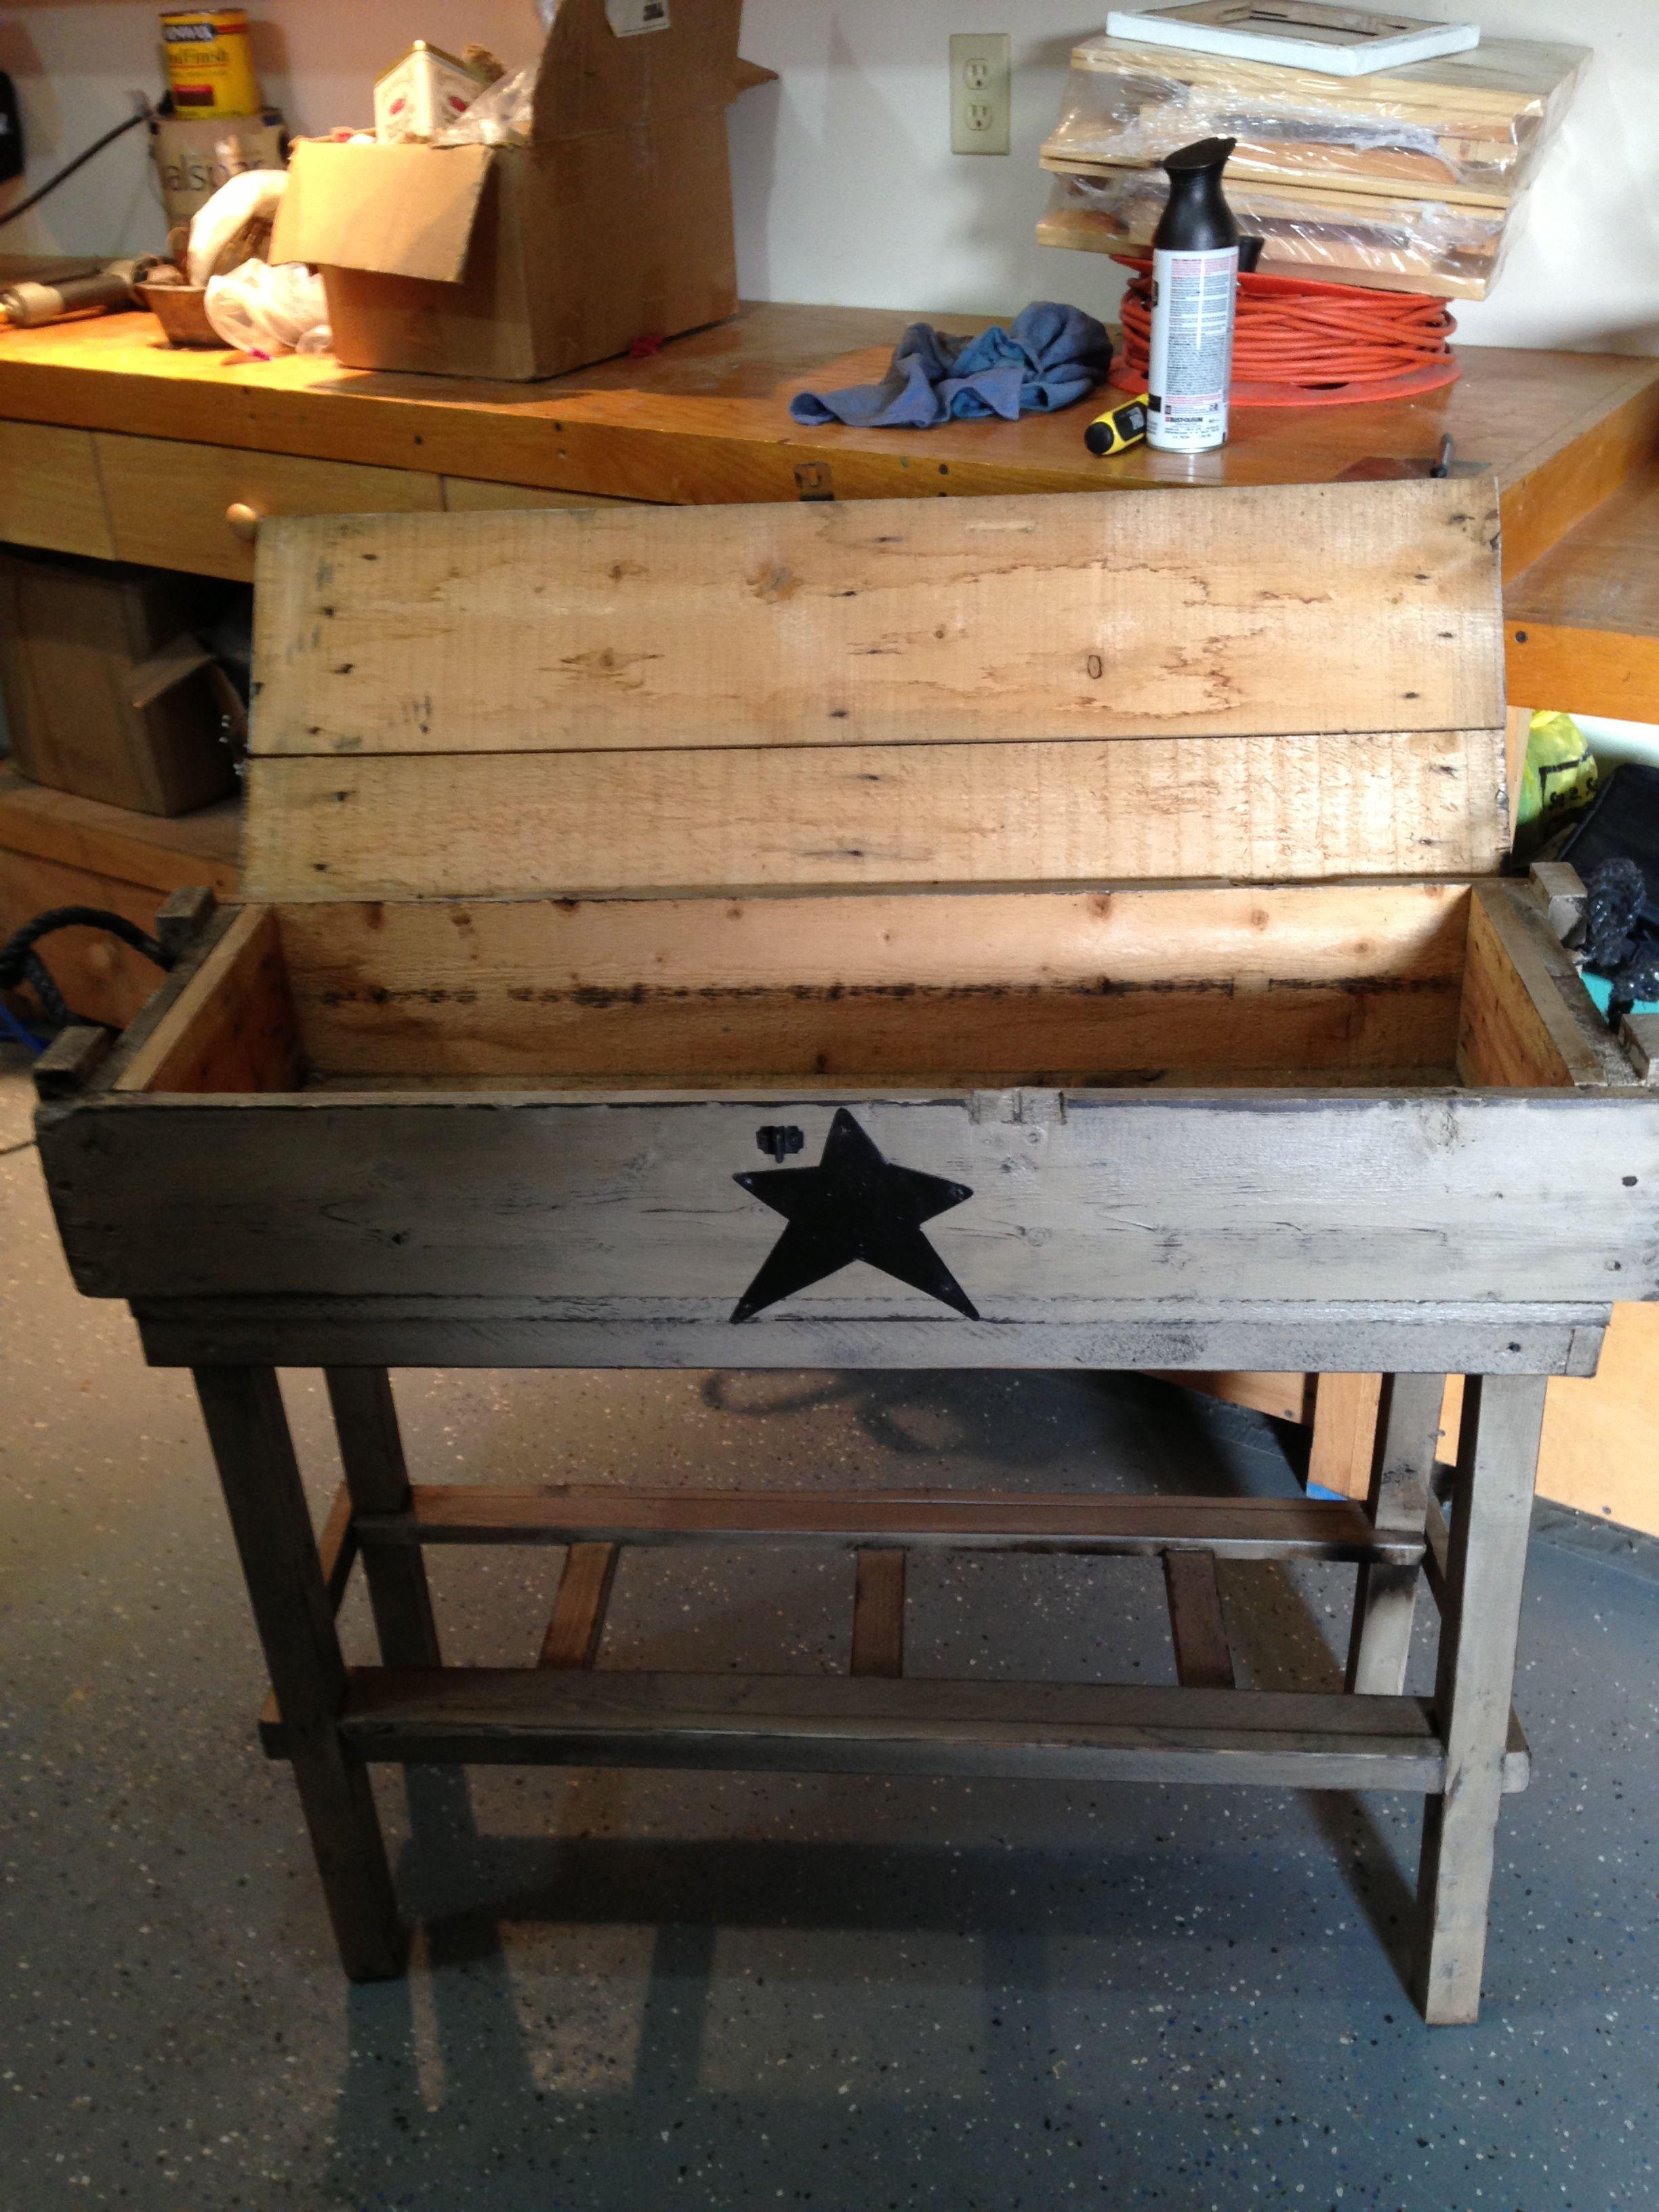 Ammo Box Table/Storage | Rustic wood crafts, Scrap wood ...